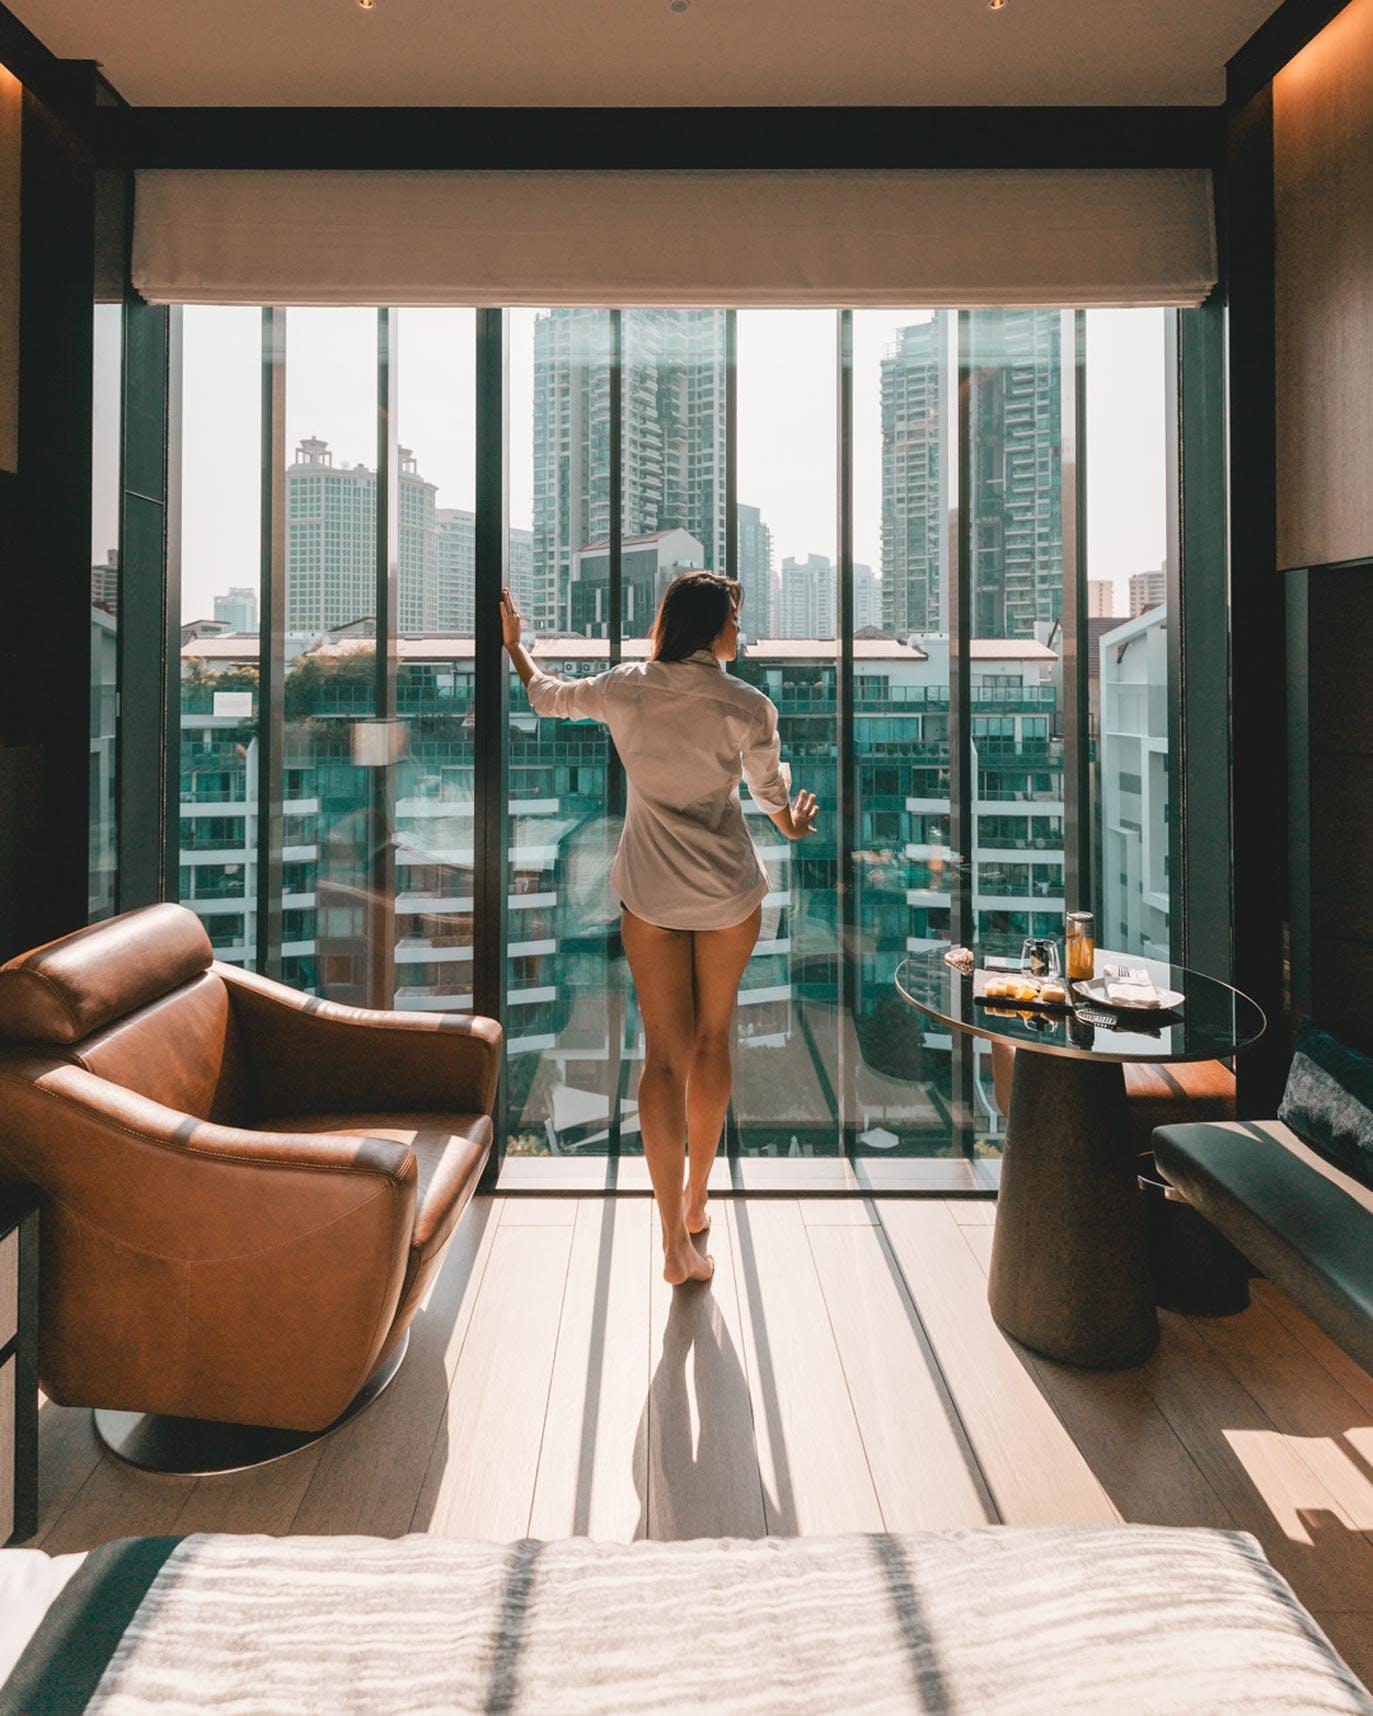 InterContinental Singapore Robertson Quay Hotel Room City View